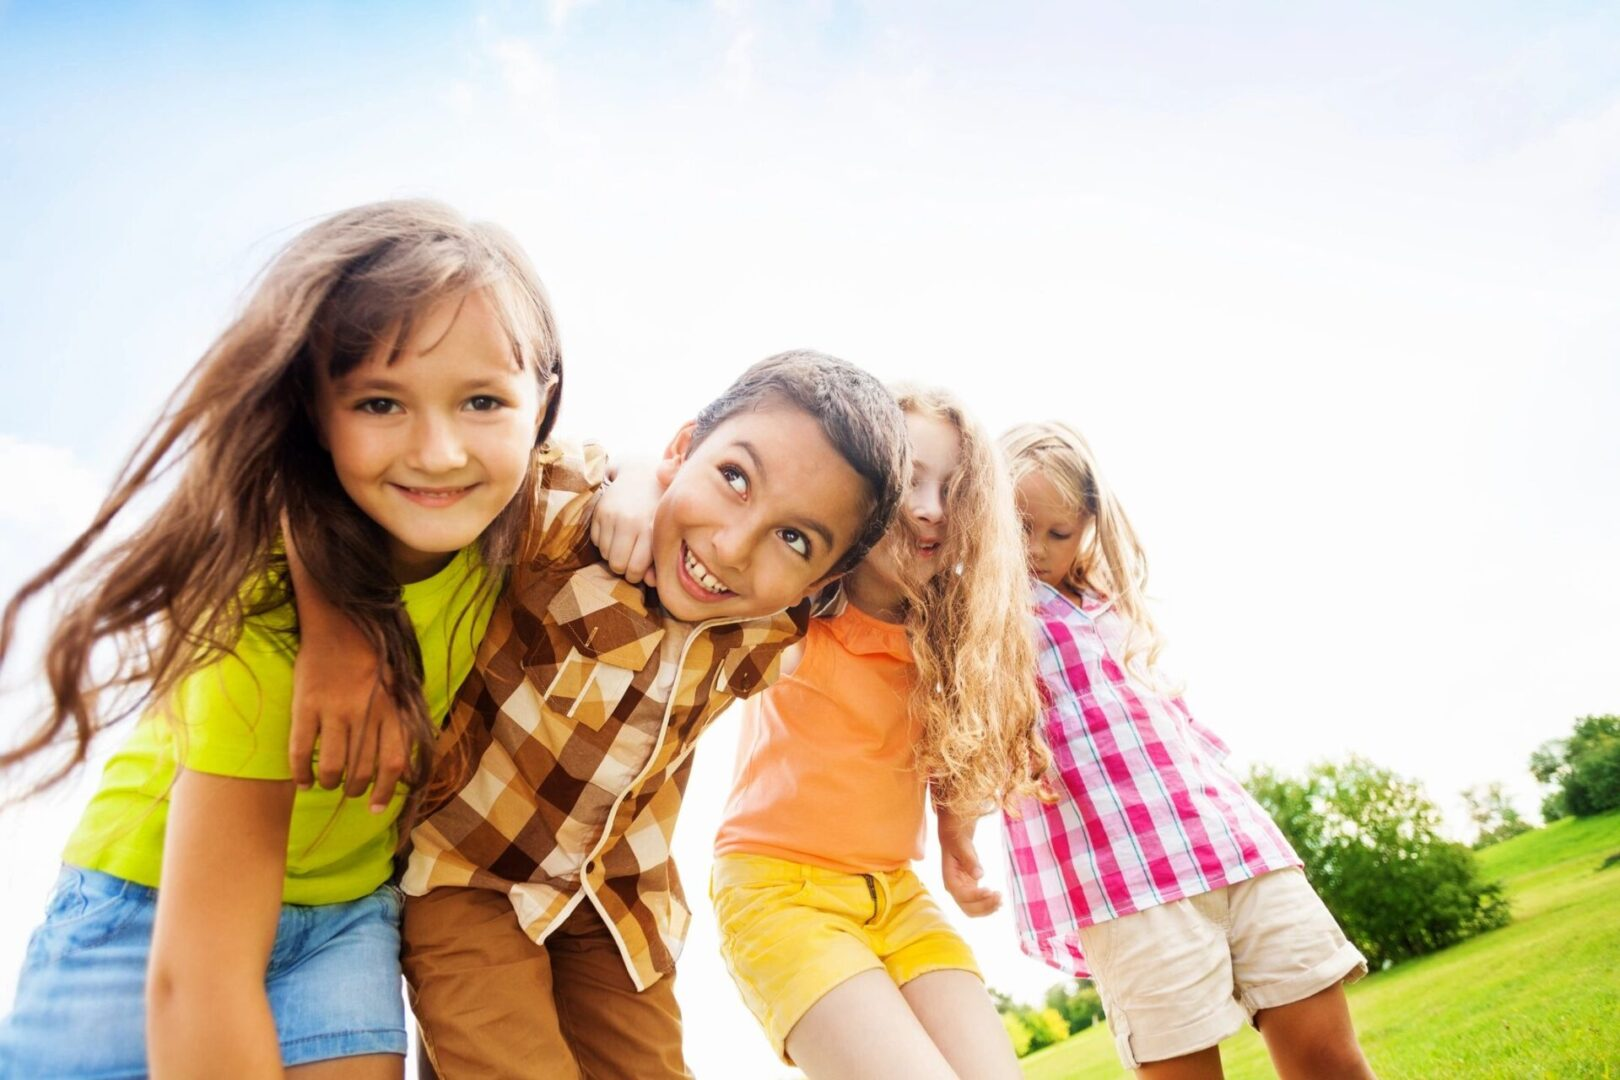 Four children outdoors